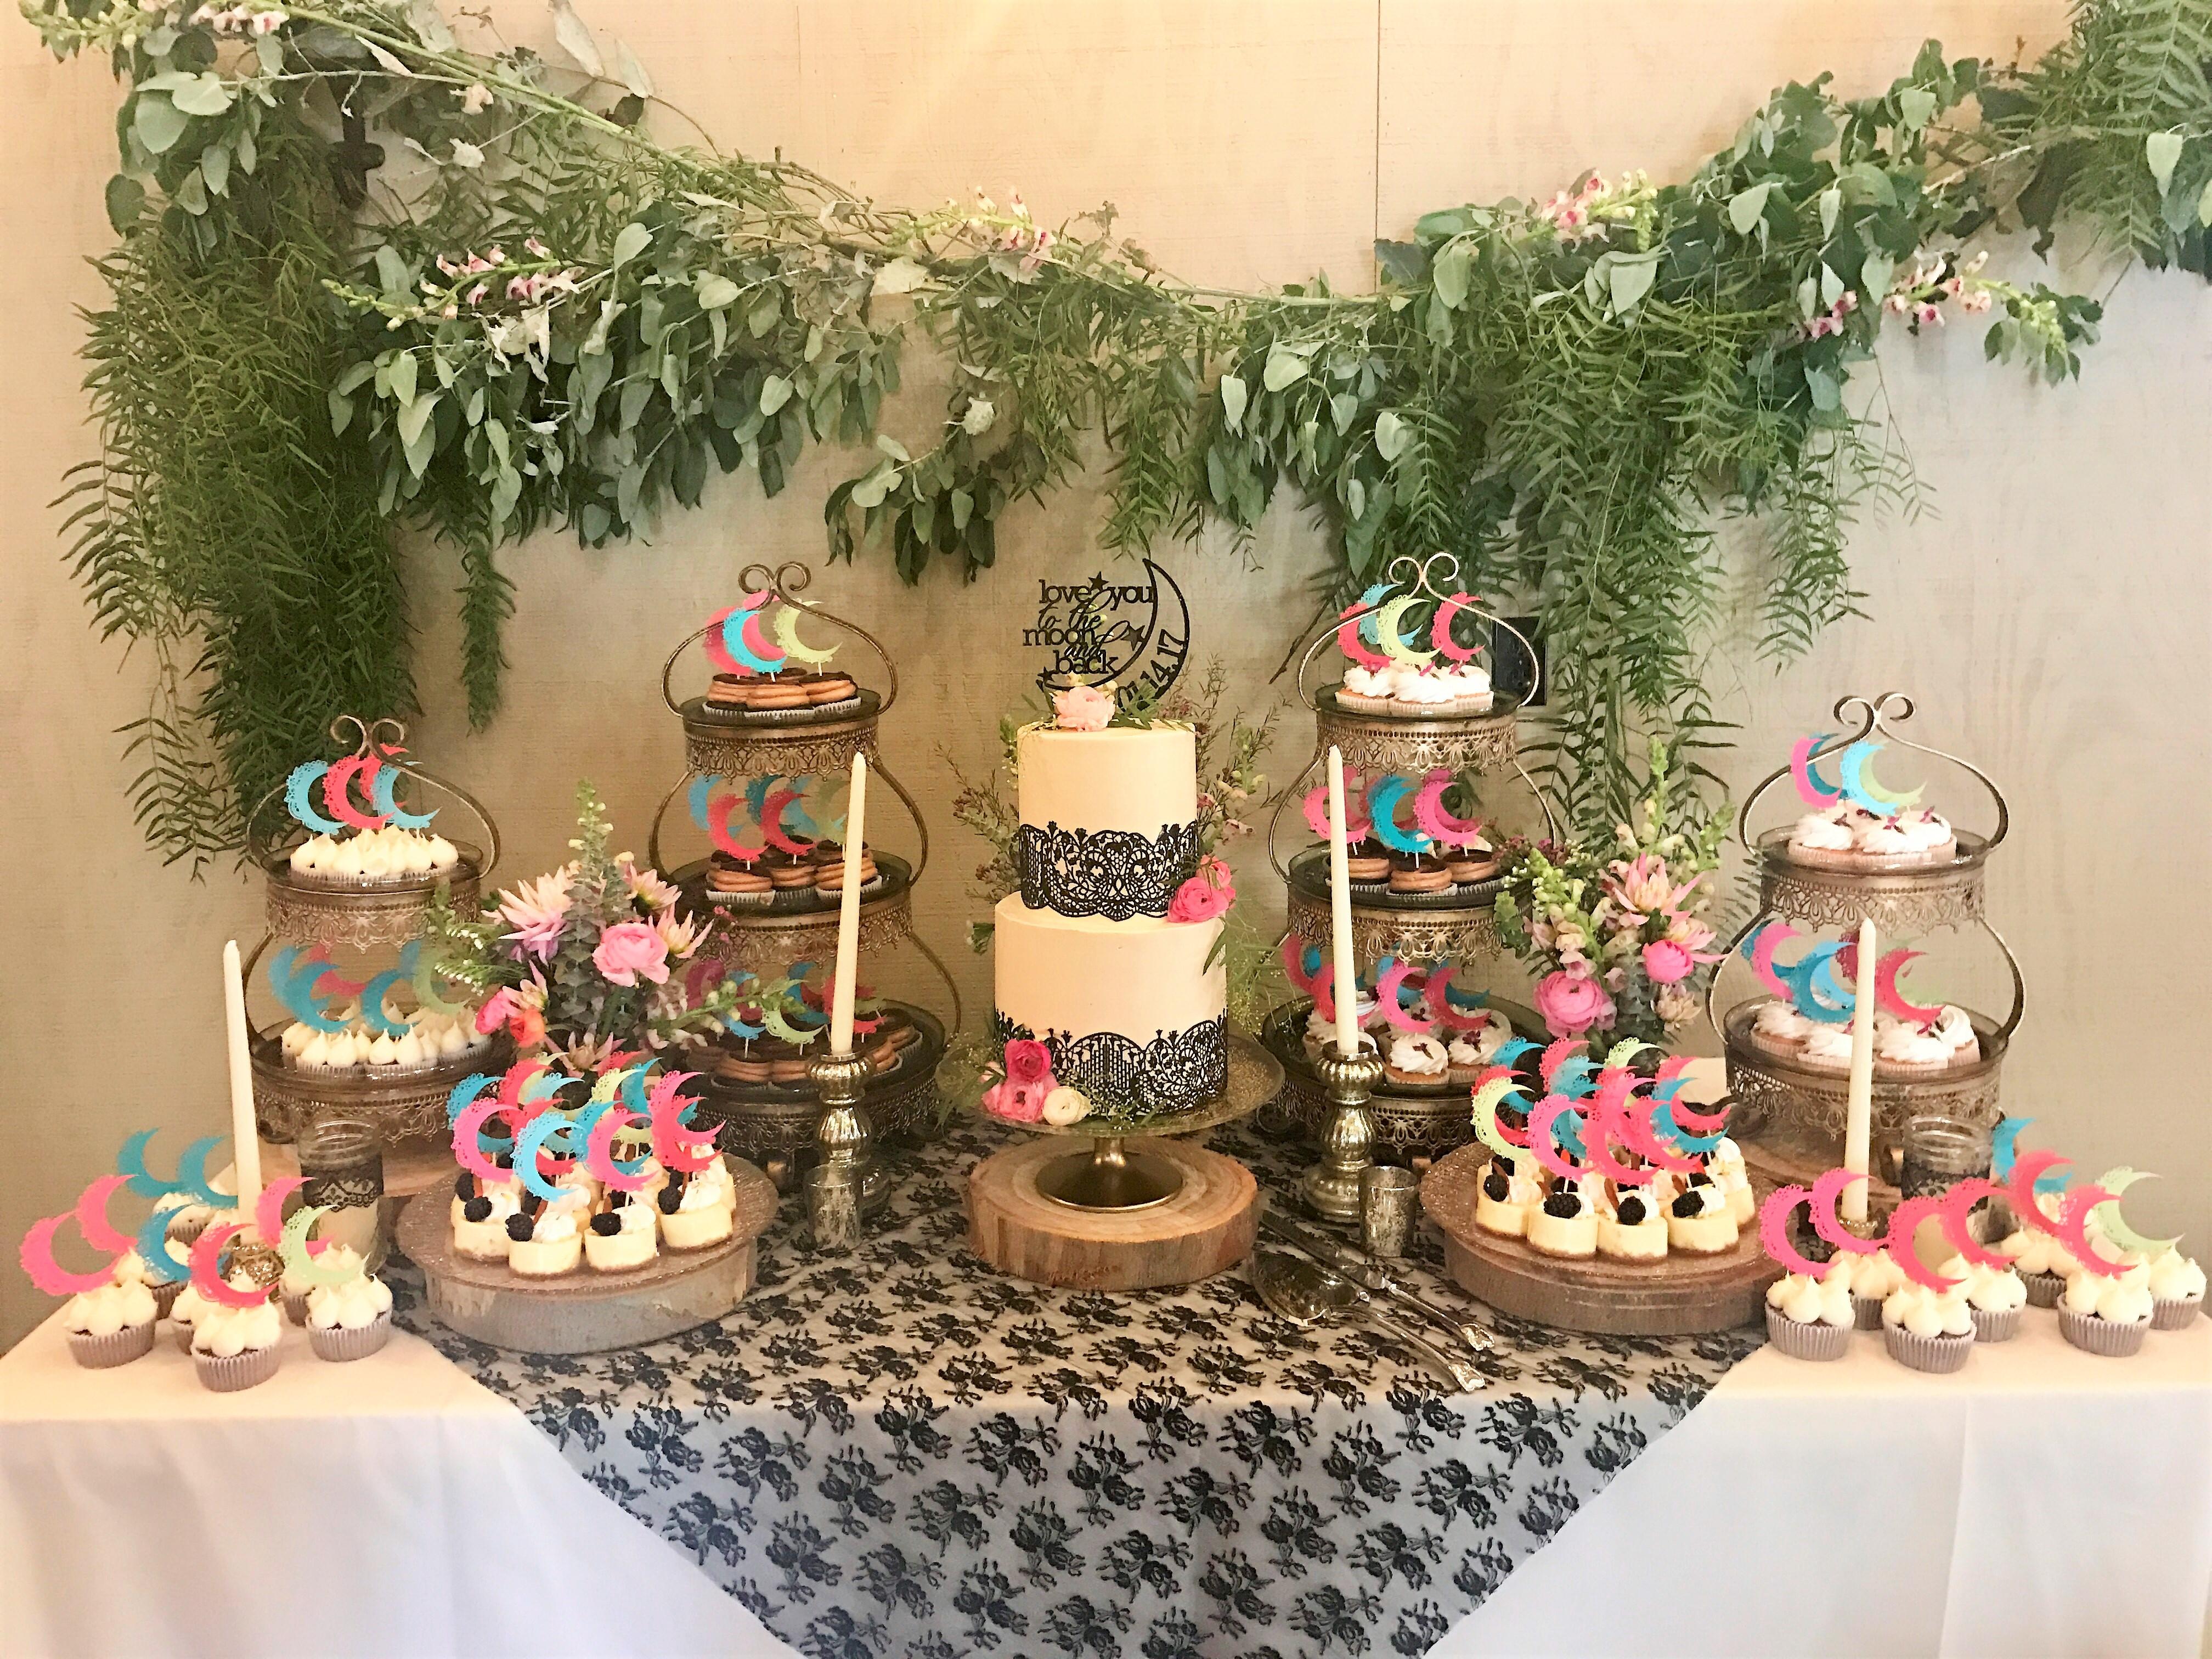 100 cupcakes, 2 tier cake cutting cake